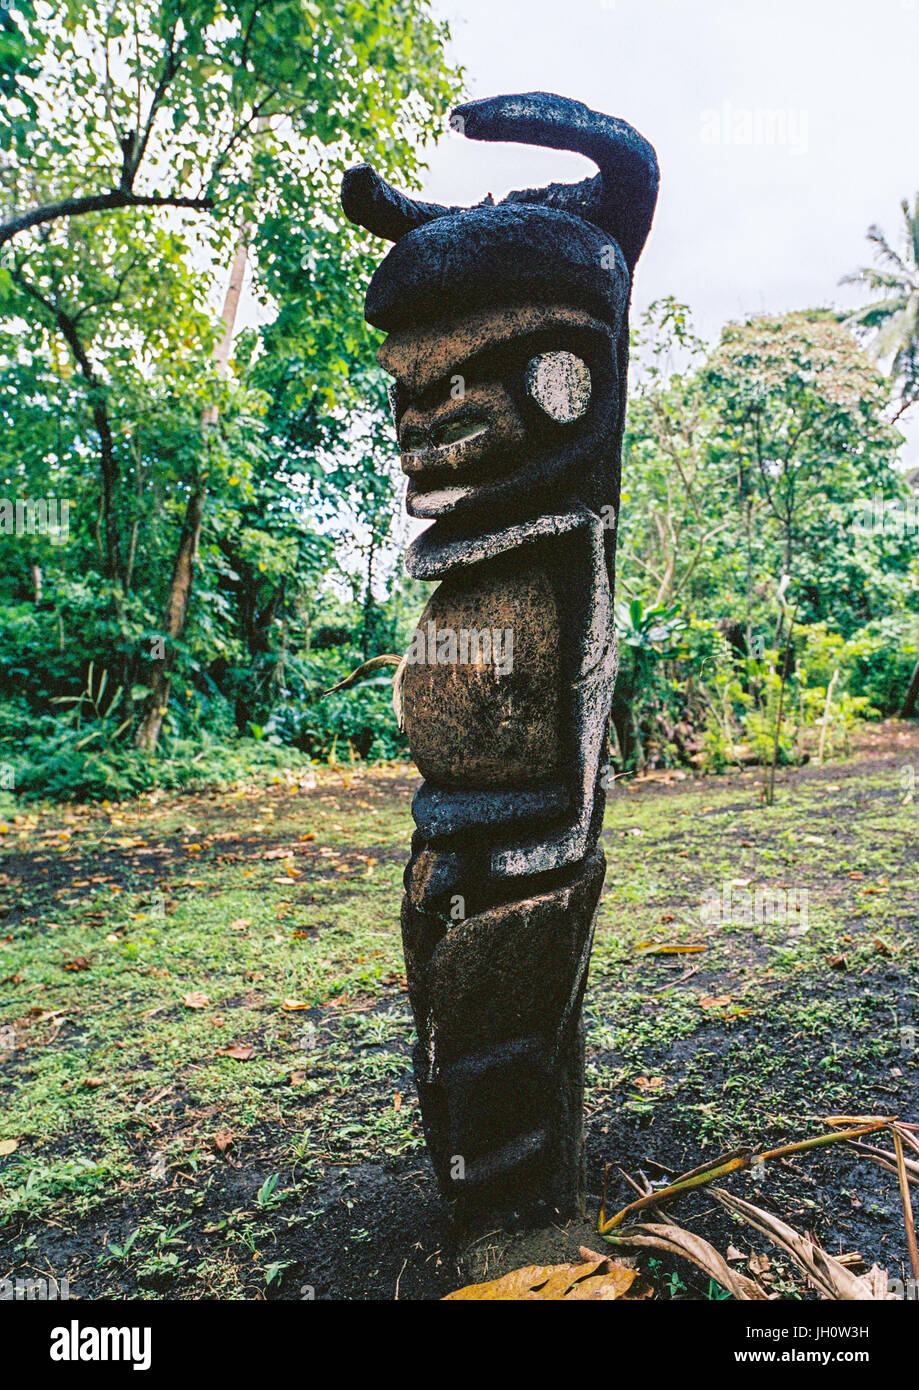 Grade statues in fern trees in the forest, Malampa Province, Malekula Island, Vanuatu - Stock Image